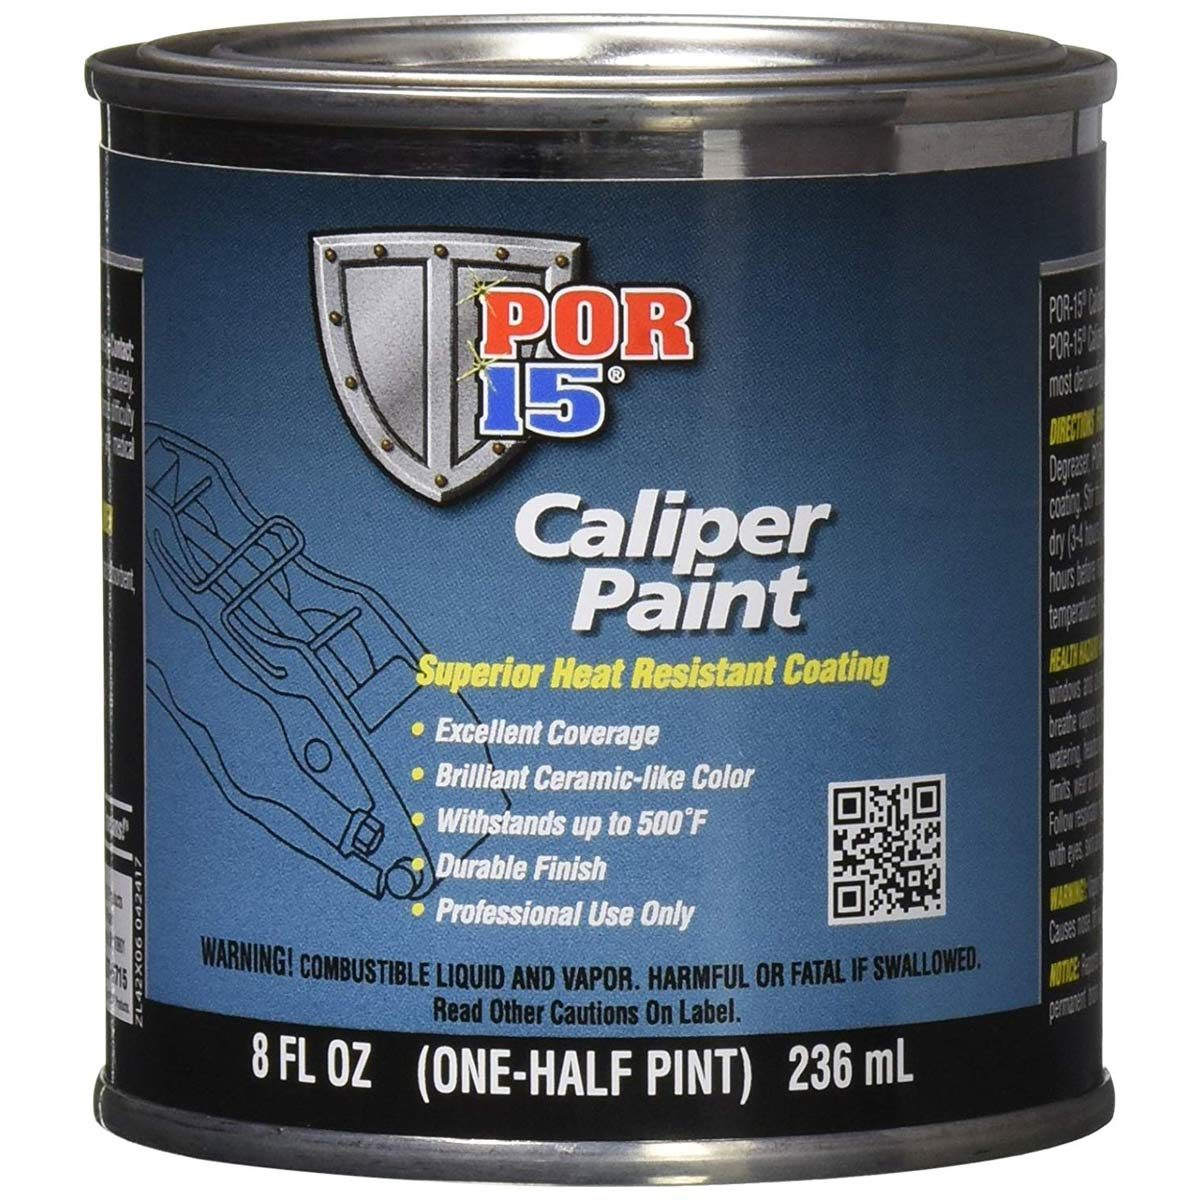 POR-15-Caliper-Paint